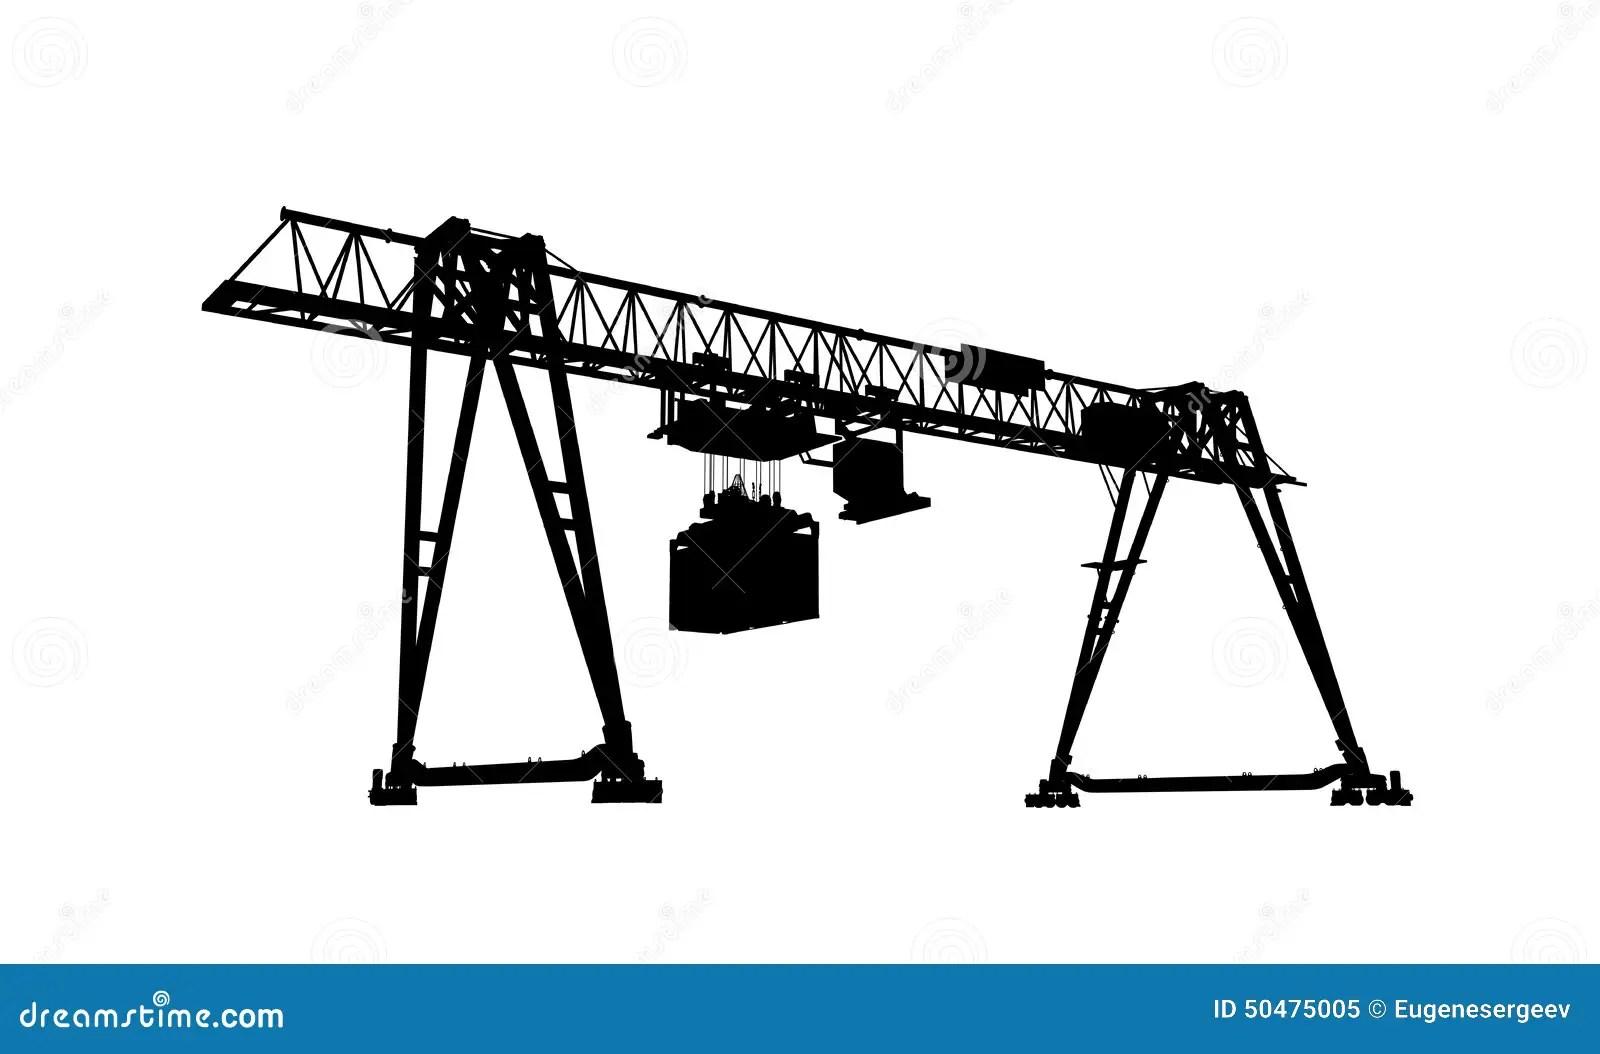 Container Bridge Crane Silhouette Isolated On White Stock